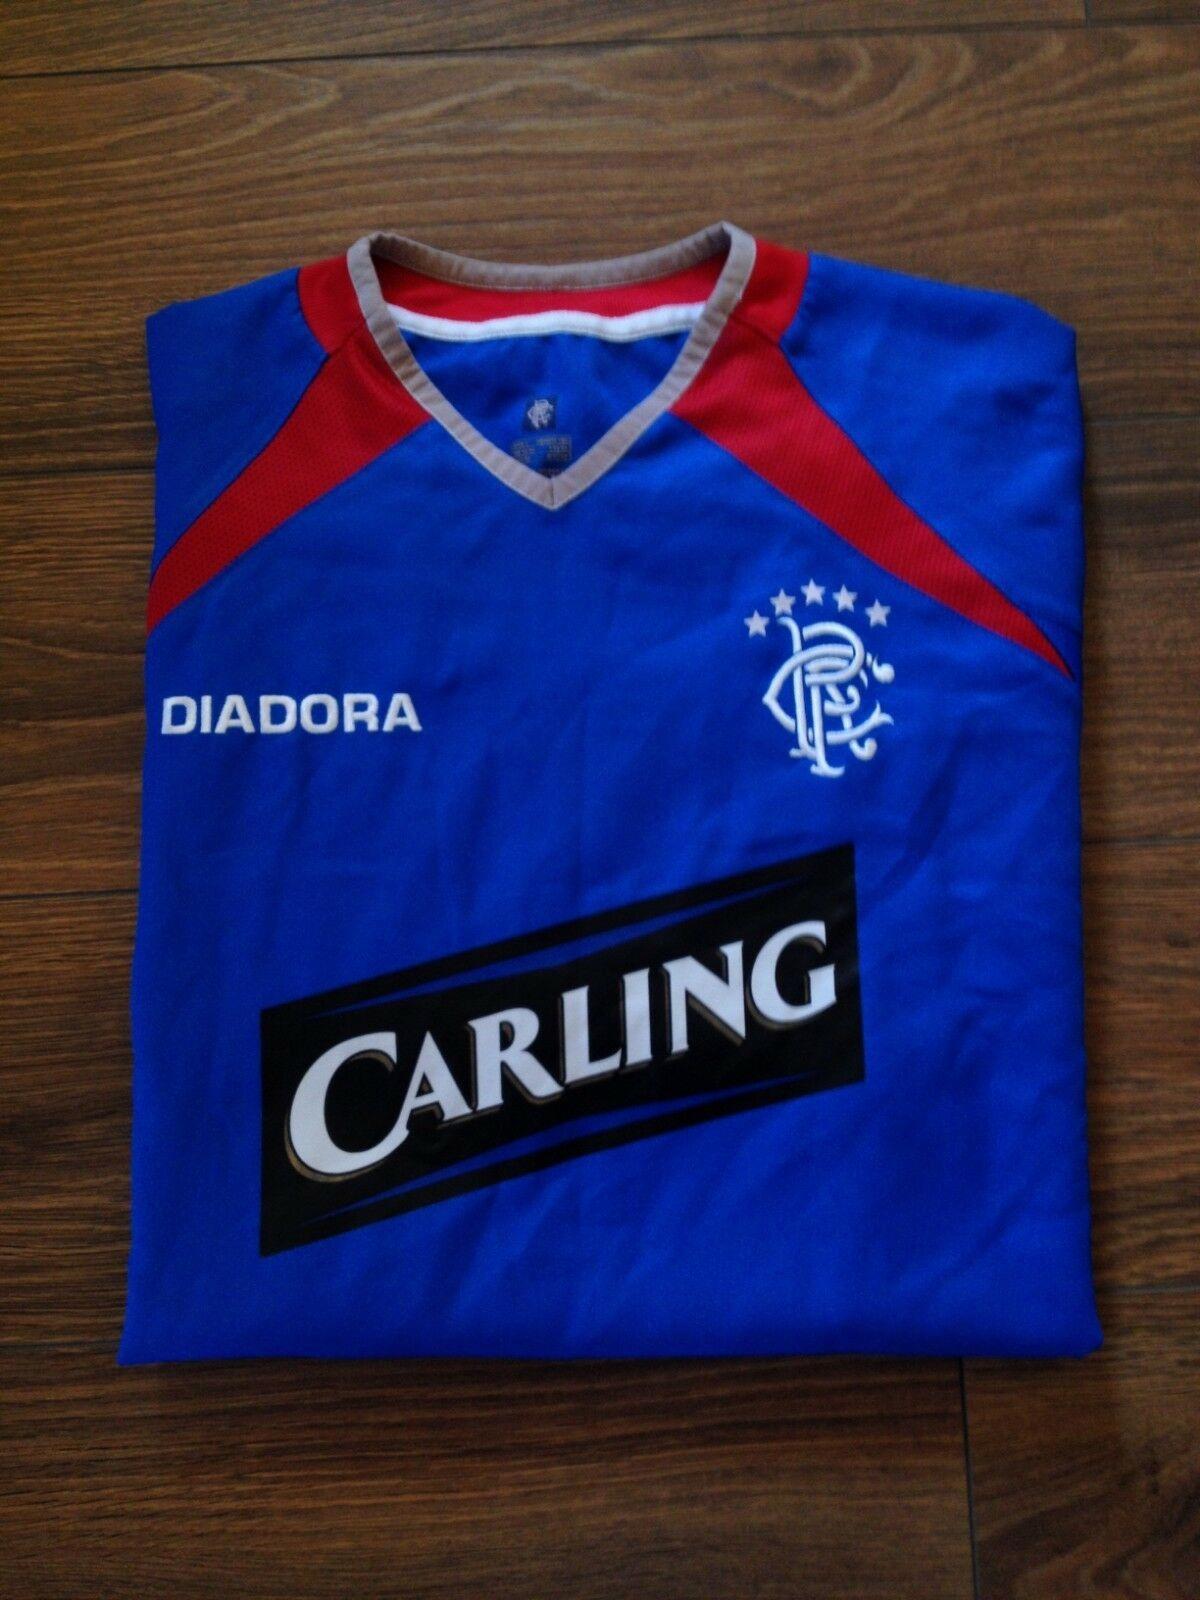 Rangers F.C. F.C. Diadora - L - OKAZJA